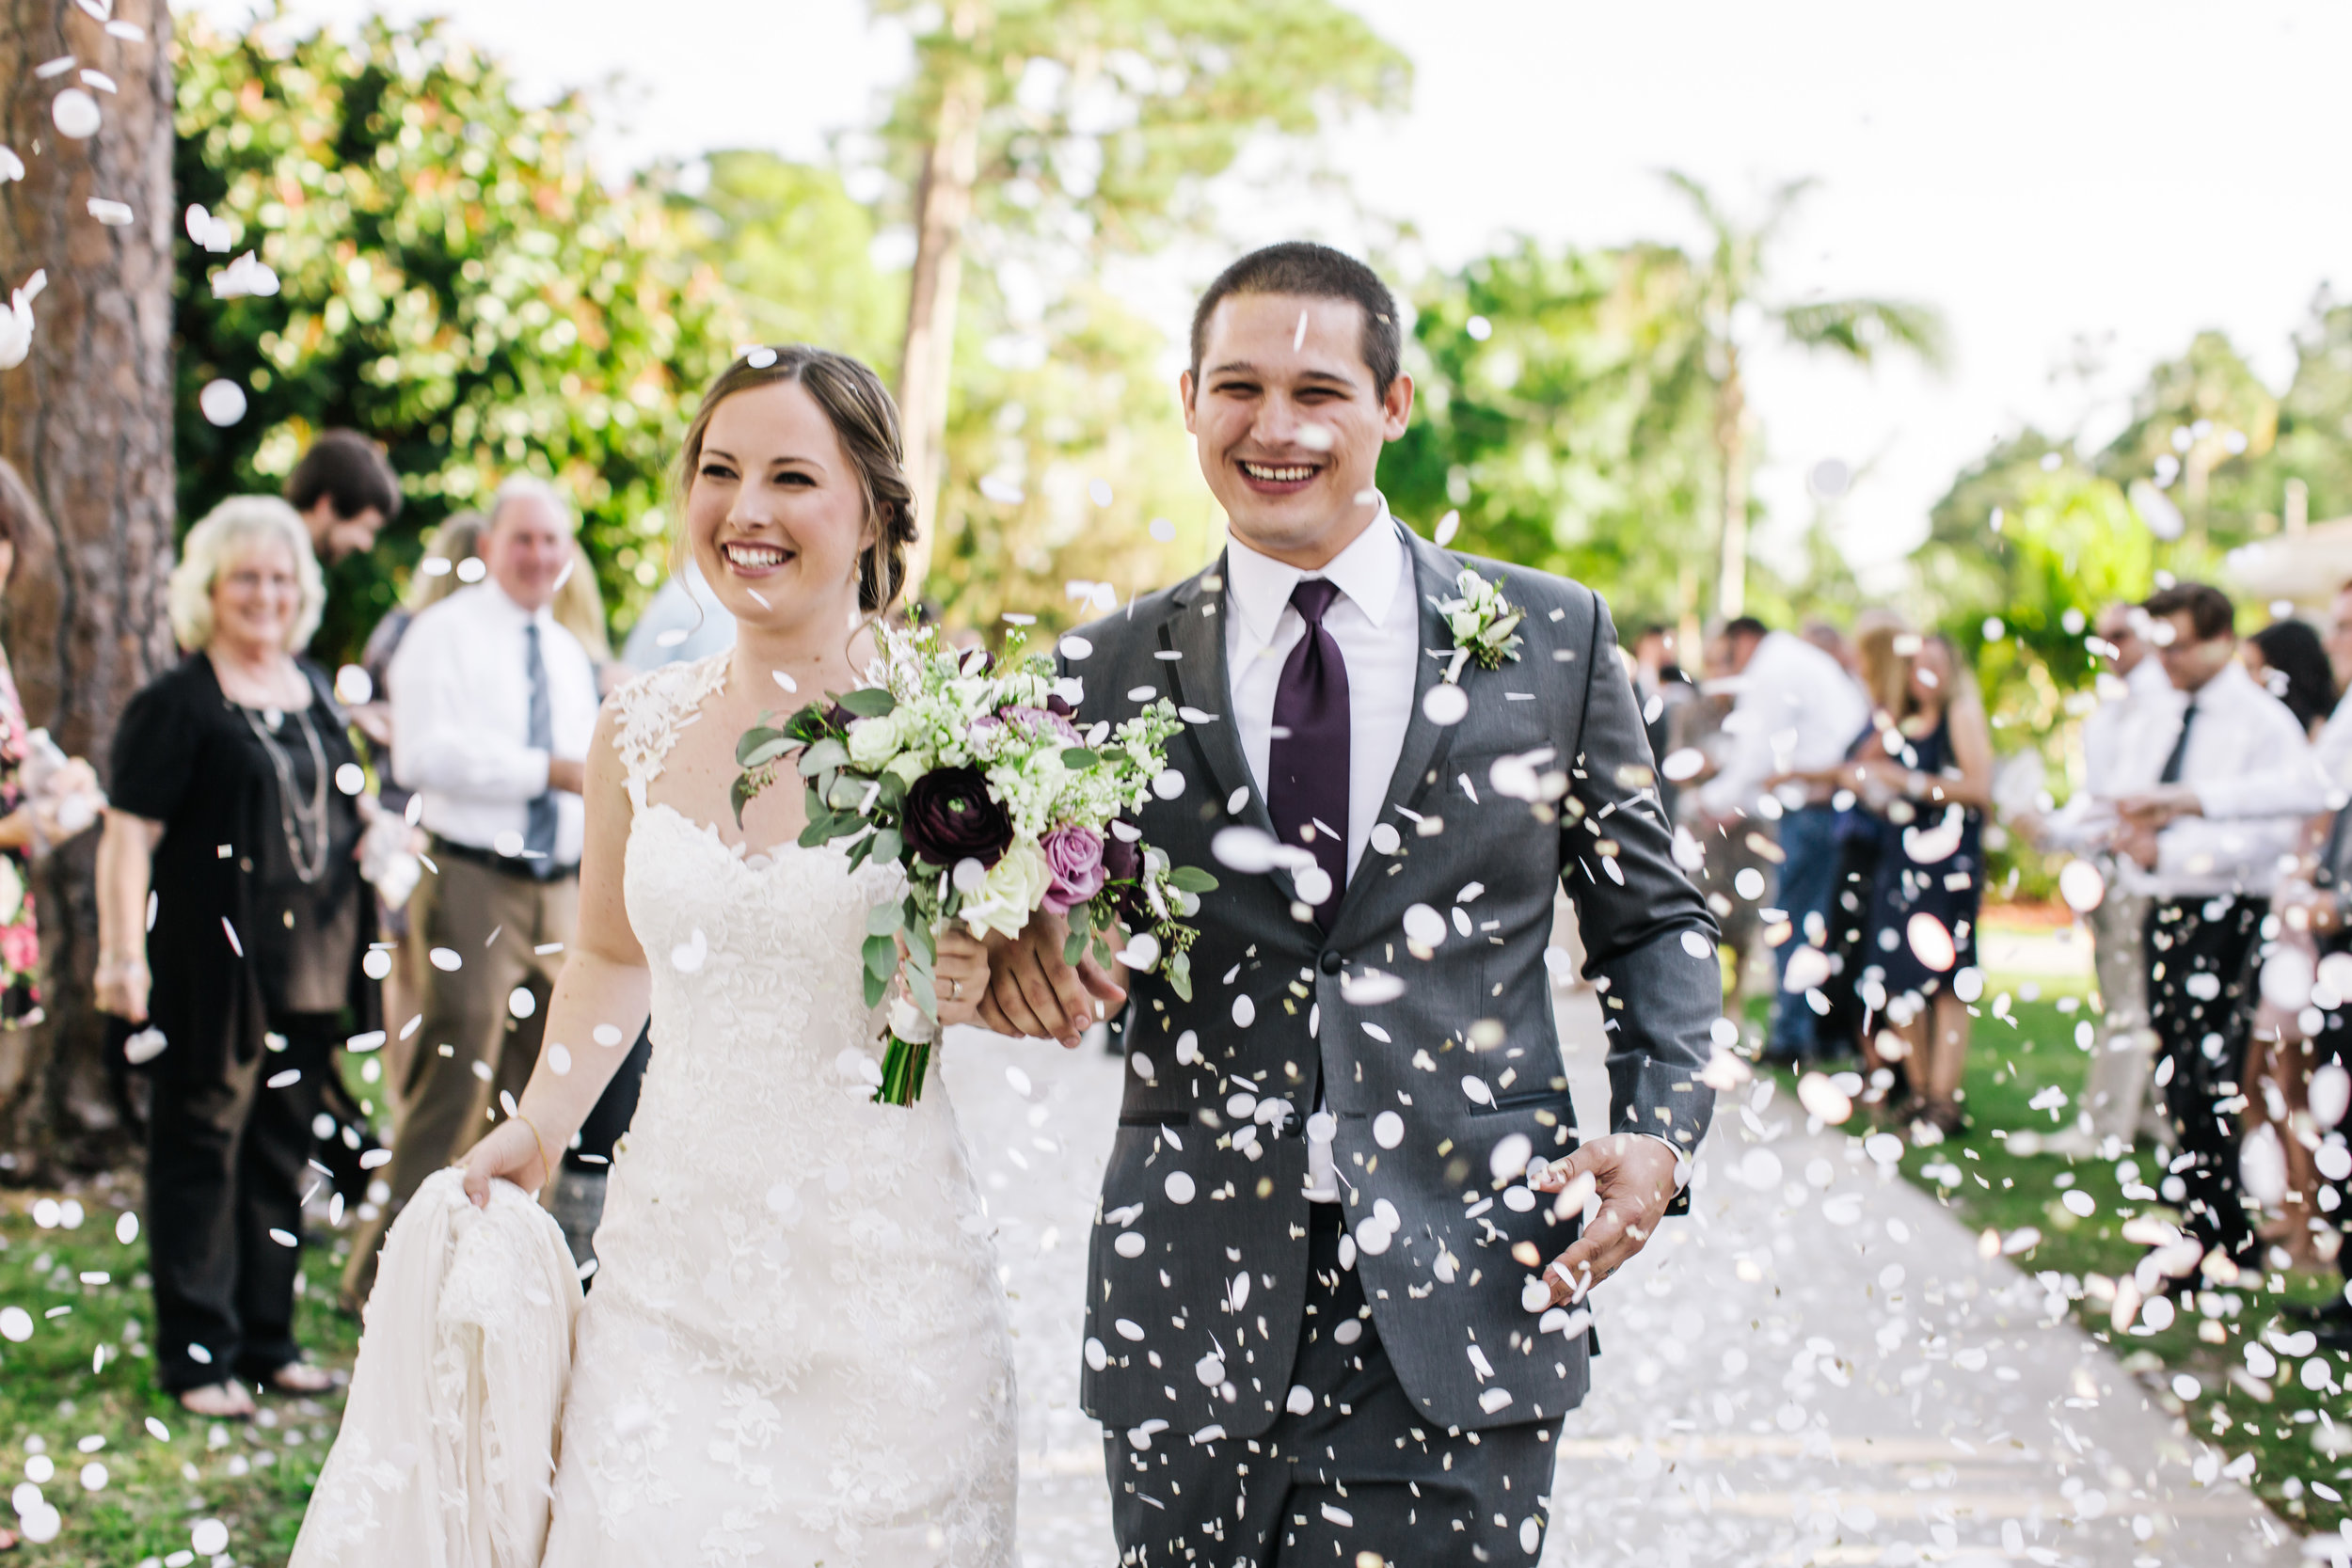 2018.02.17 Whitney and Joe Meyer Melbourne Wedding (344 of 759).jpg